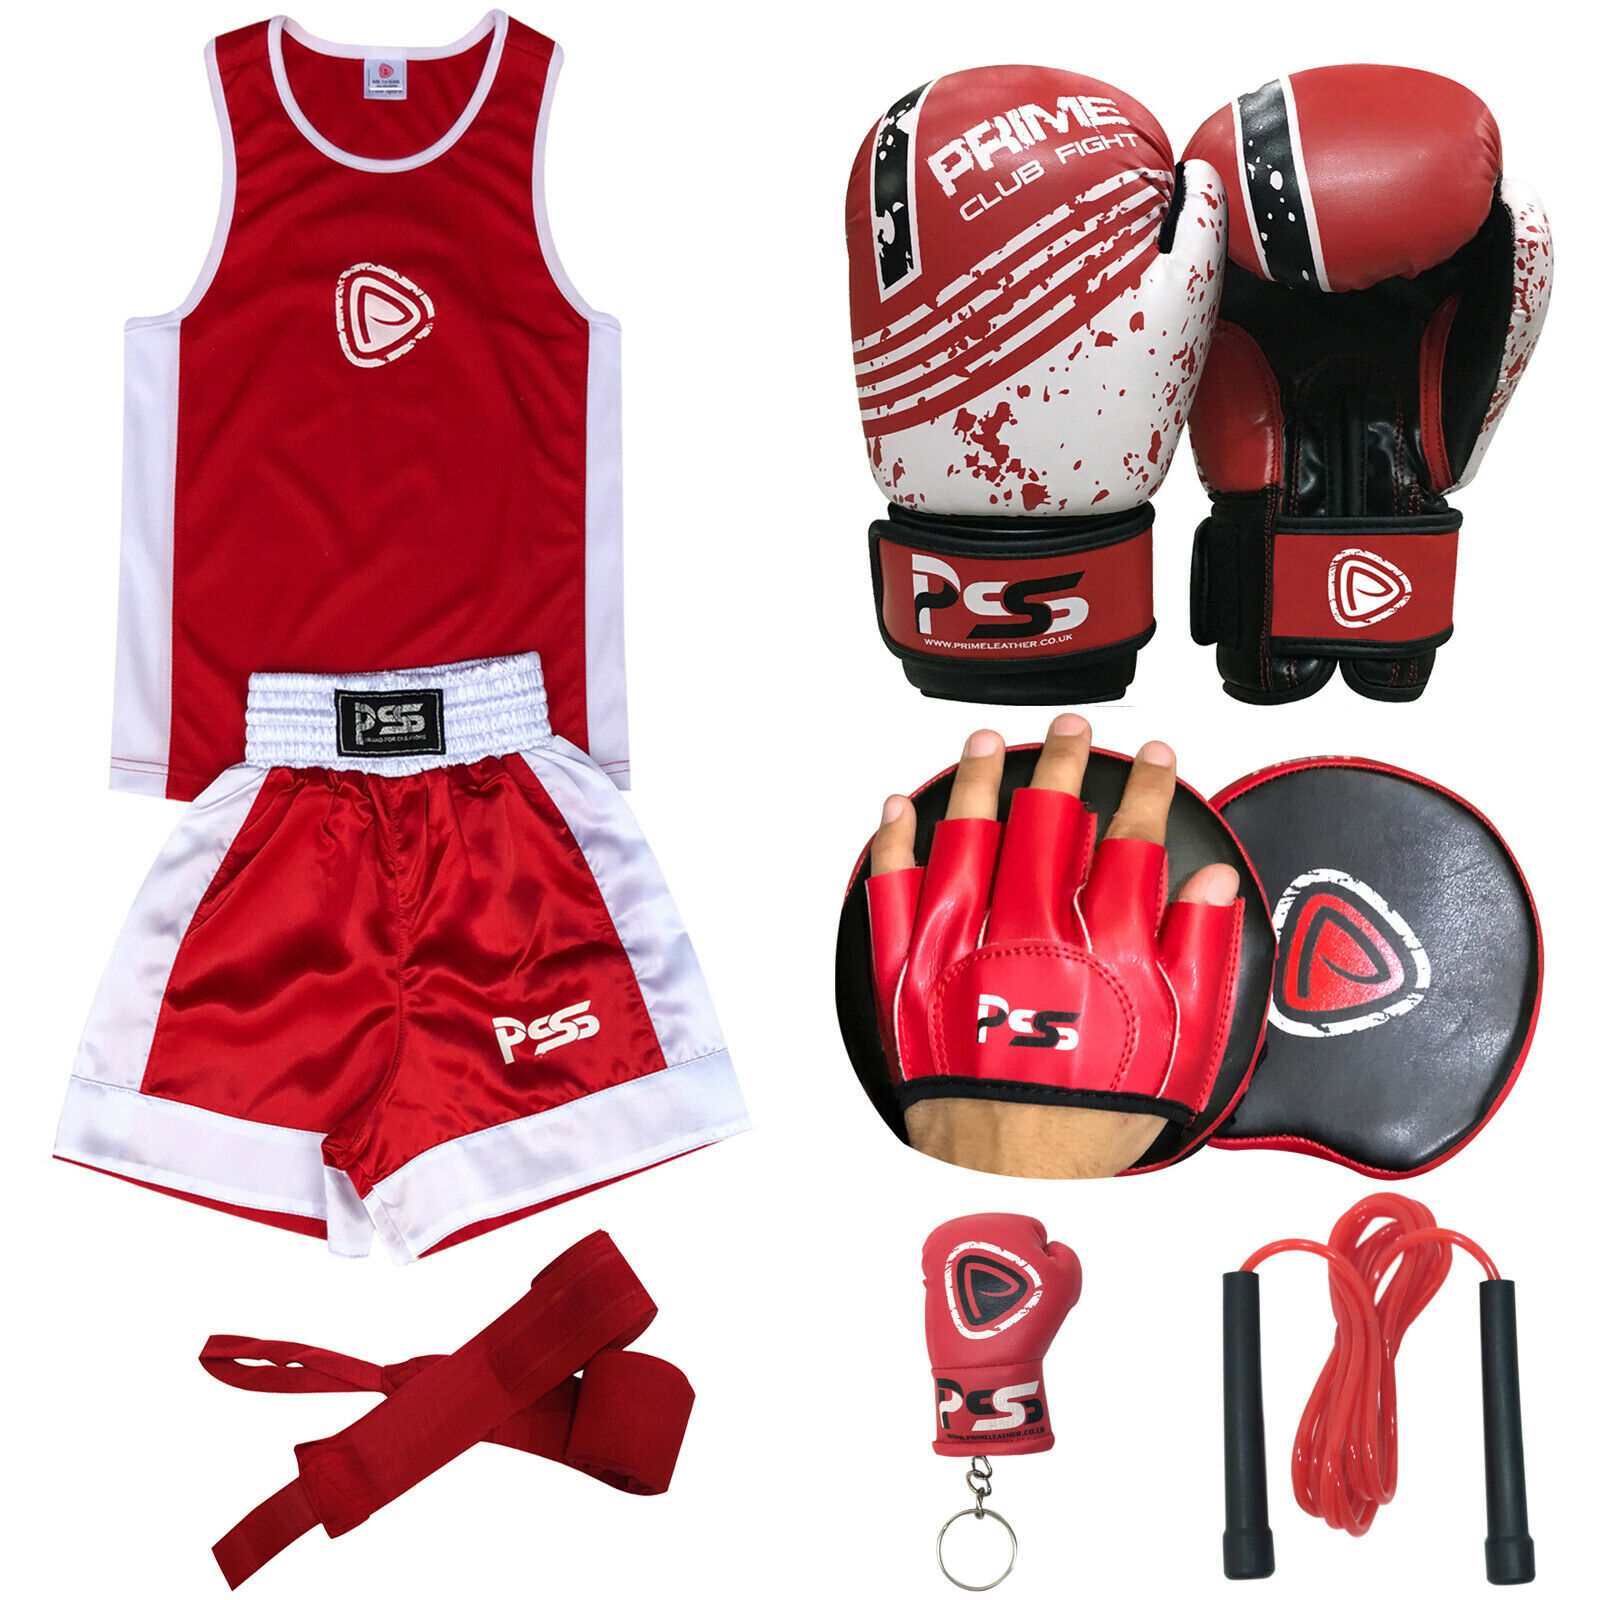 New Kids Boxing Gloves Punching Training Bag Gloves Muay Thai Grappling 1004